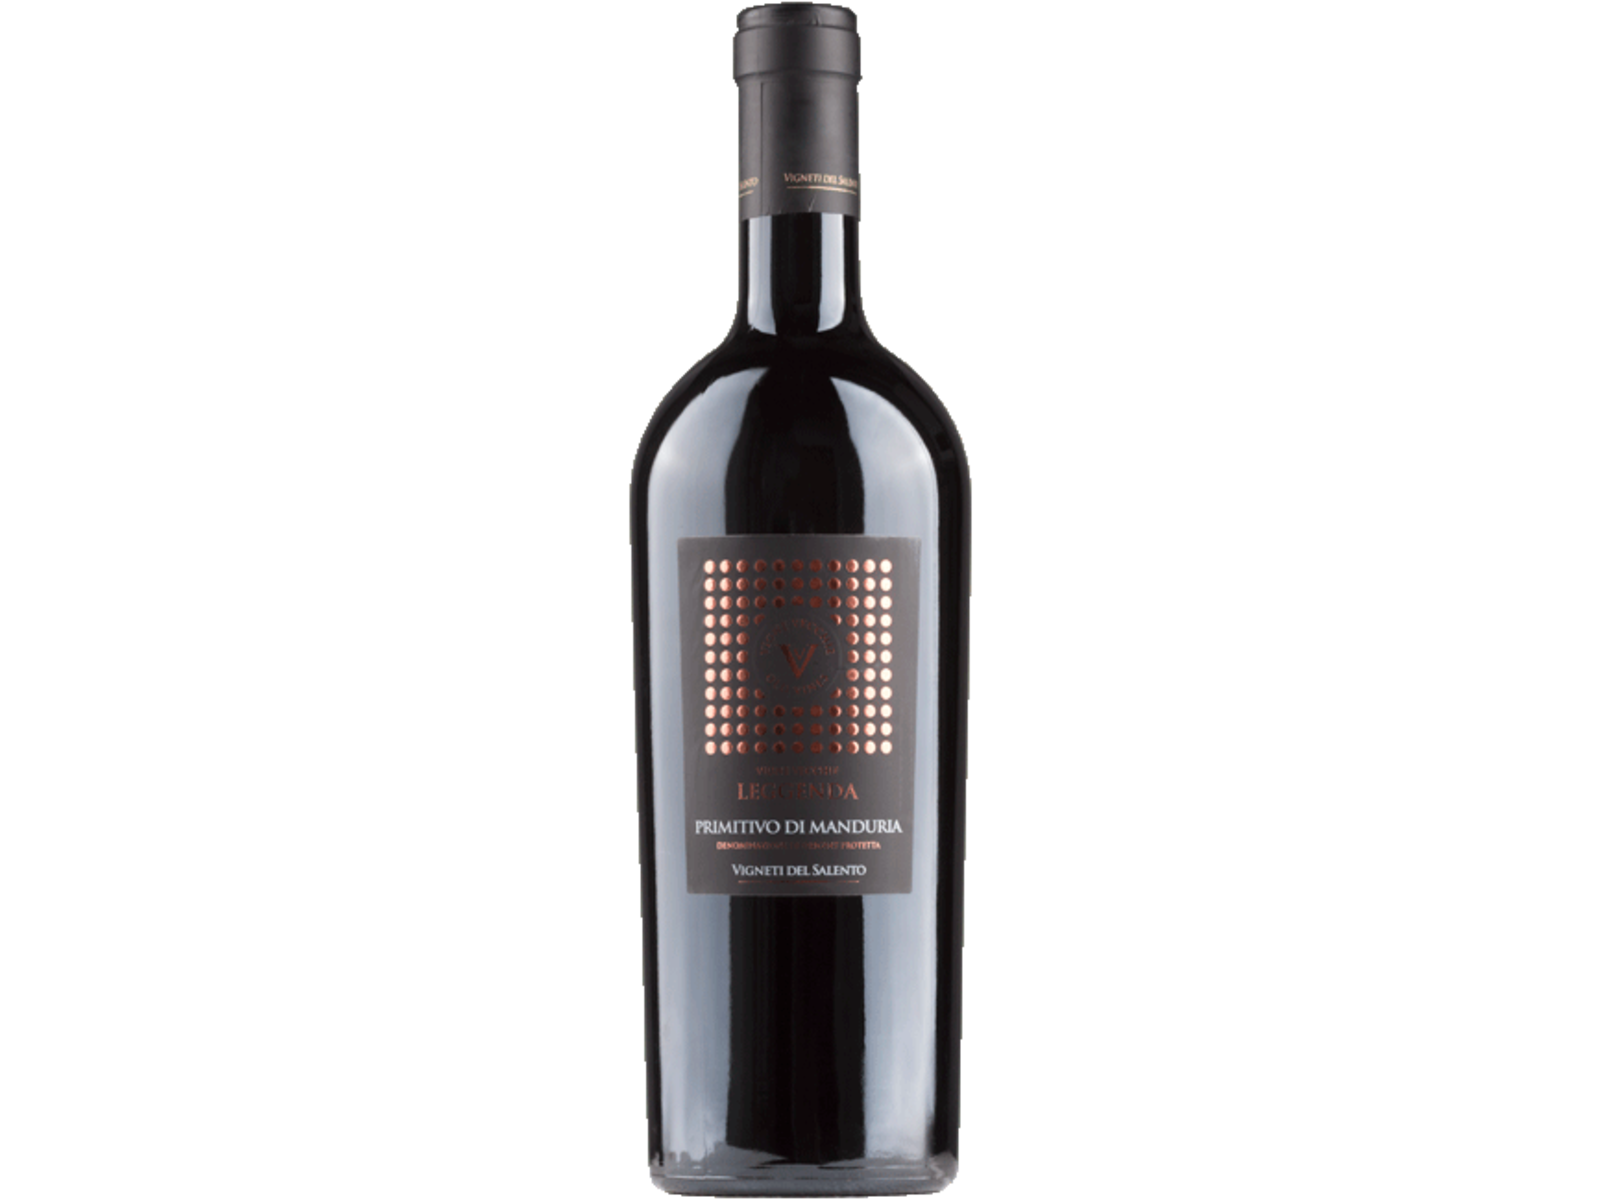 Farnese Vini Vigne Vecchie Leggenda Primitivo di Manduria